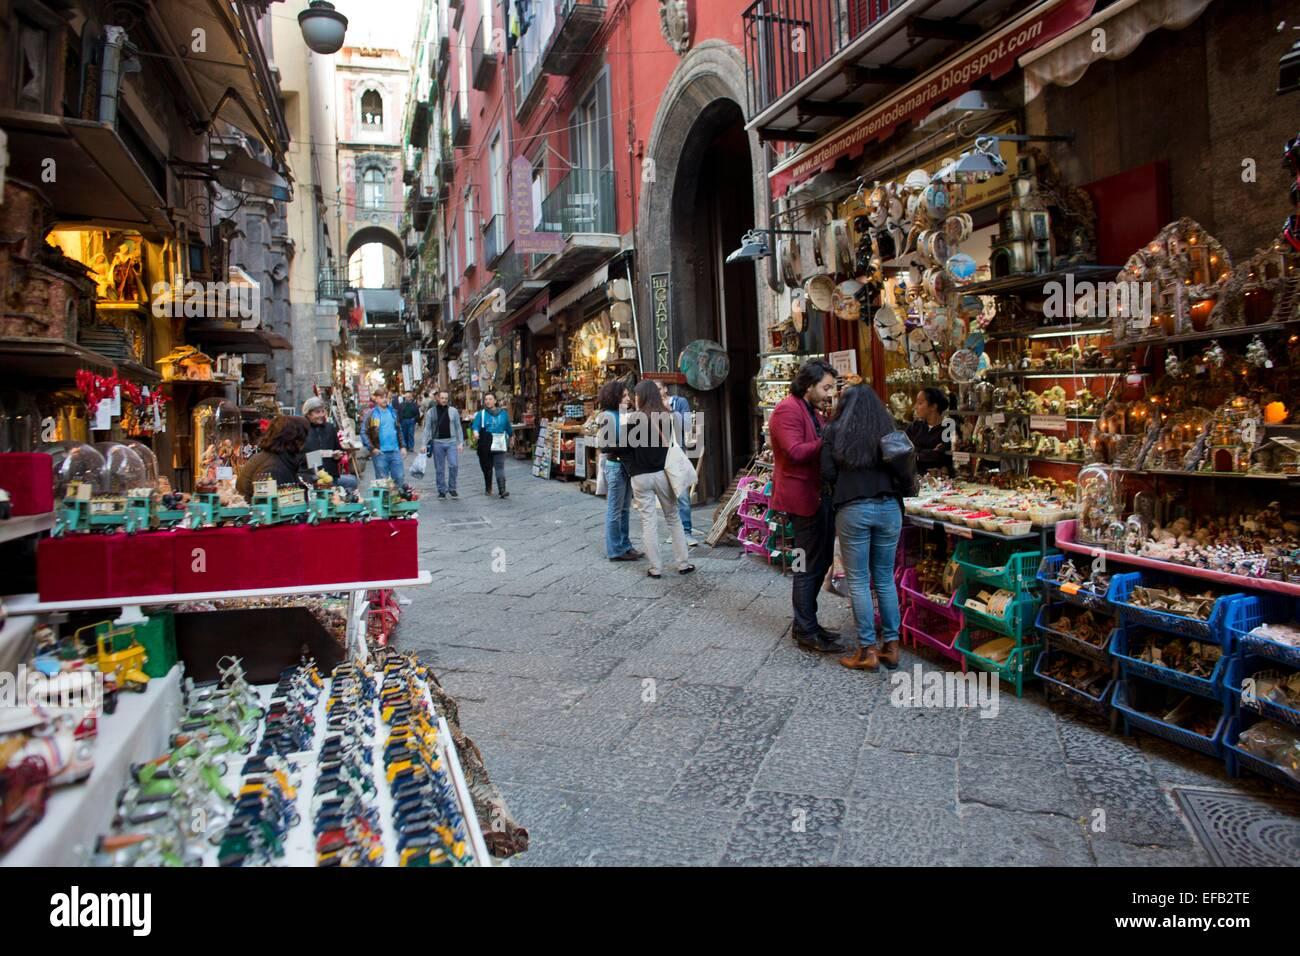 Souvenir shops in presepi street in naples stock photo for Craft stores naples fl